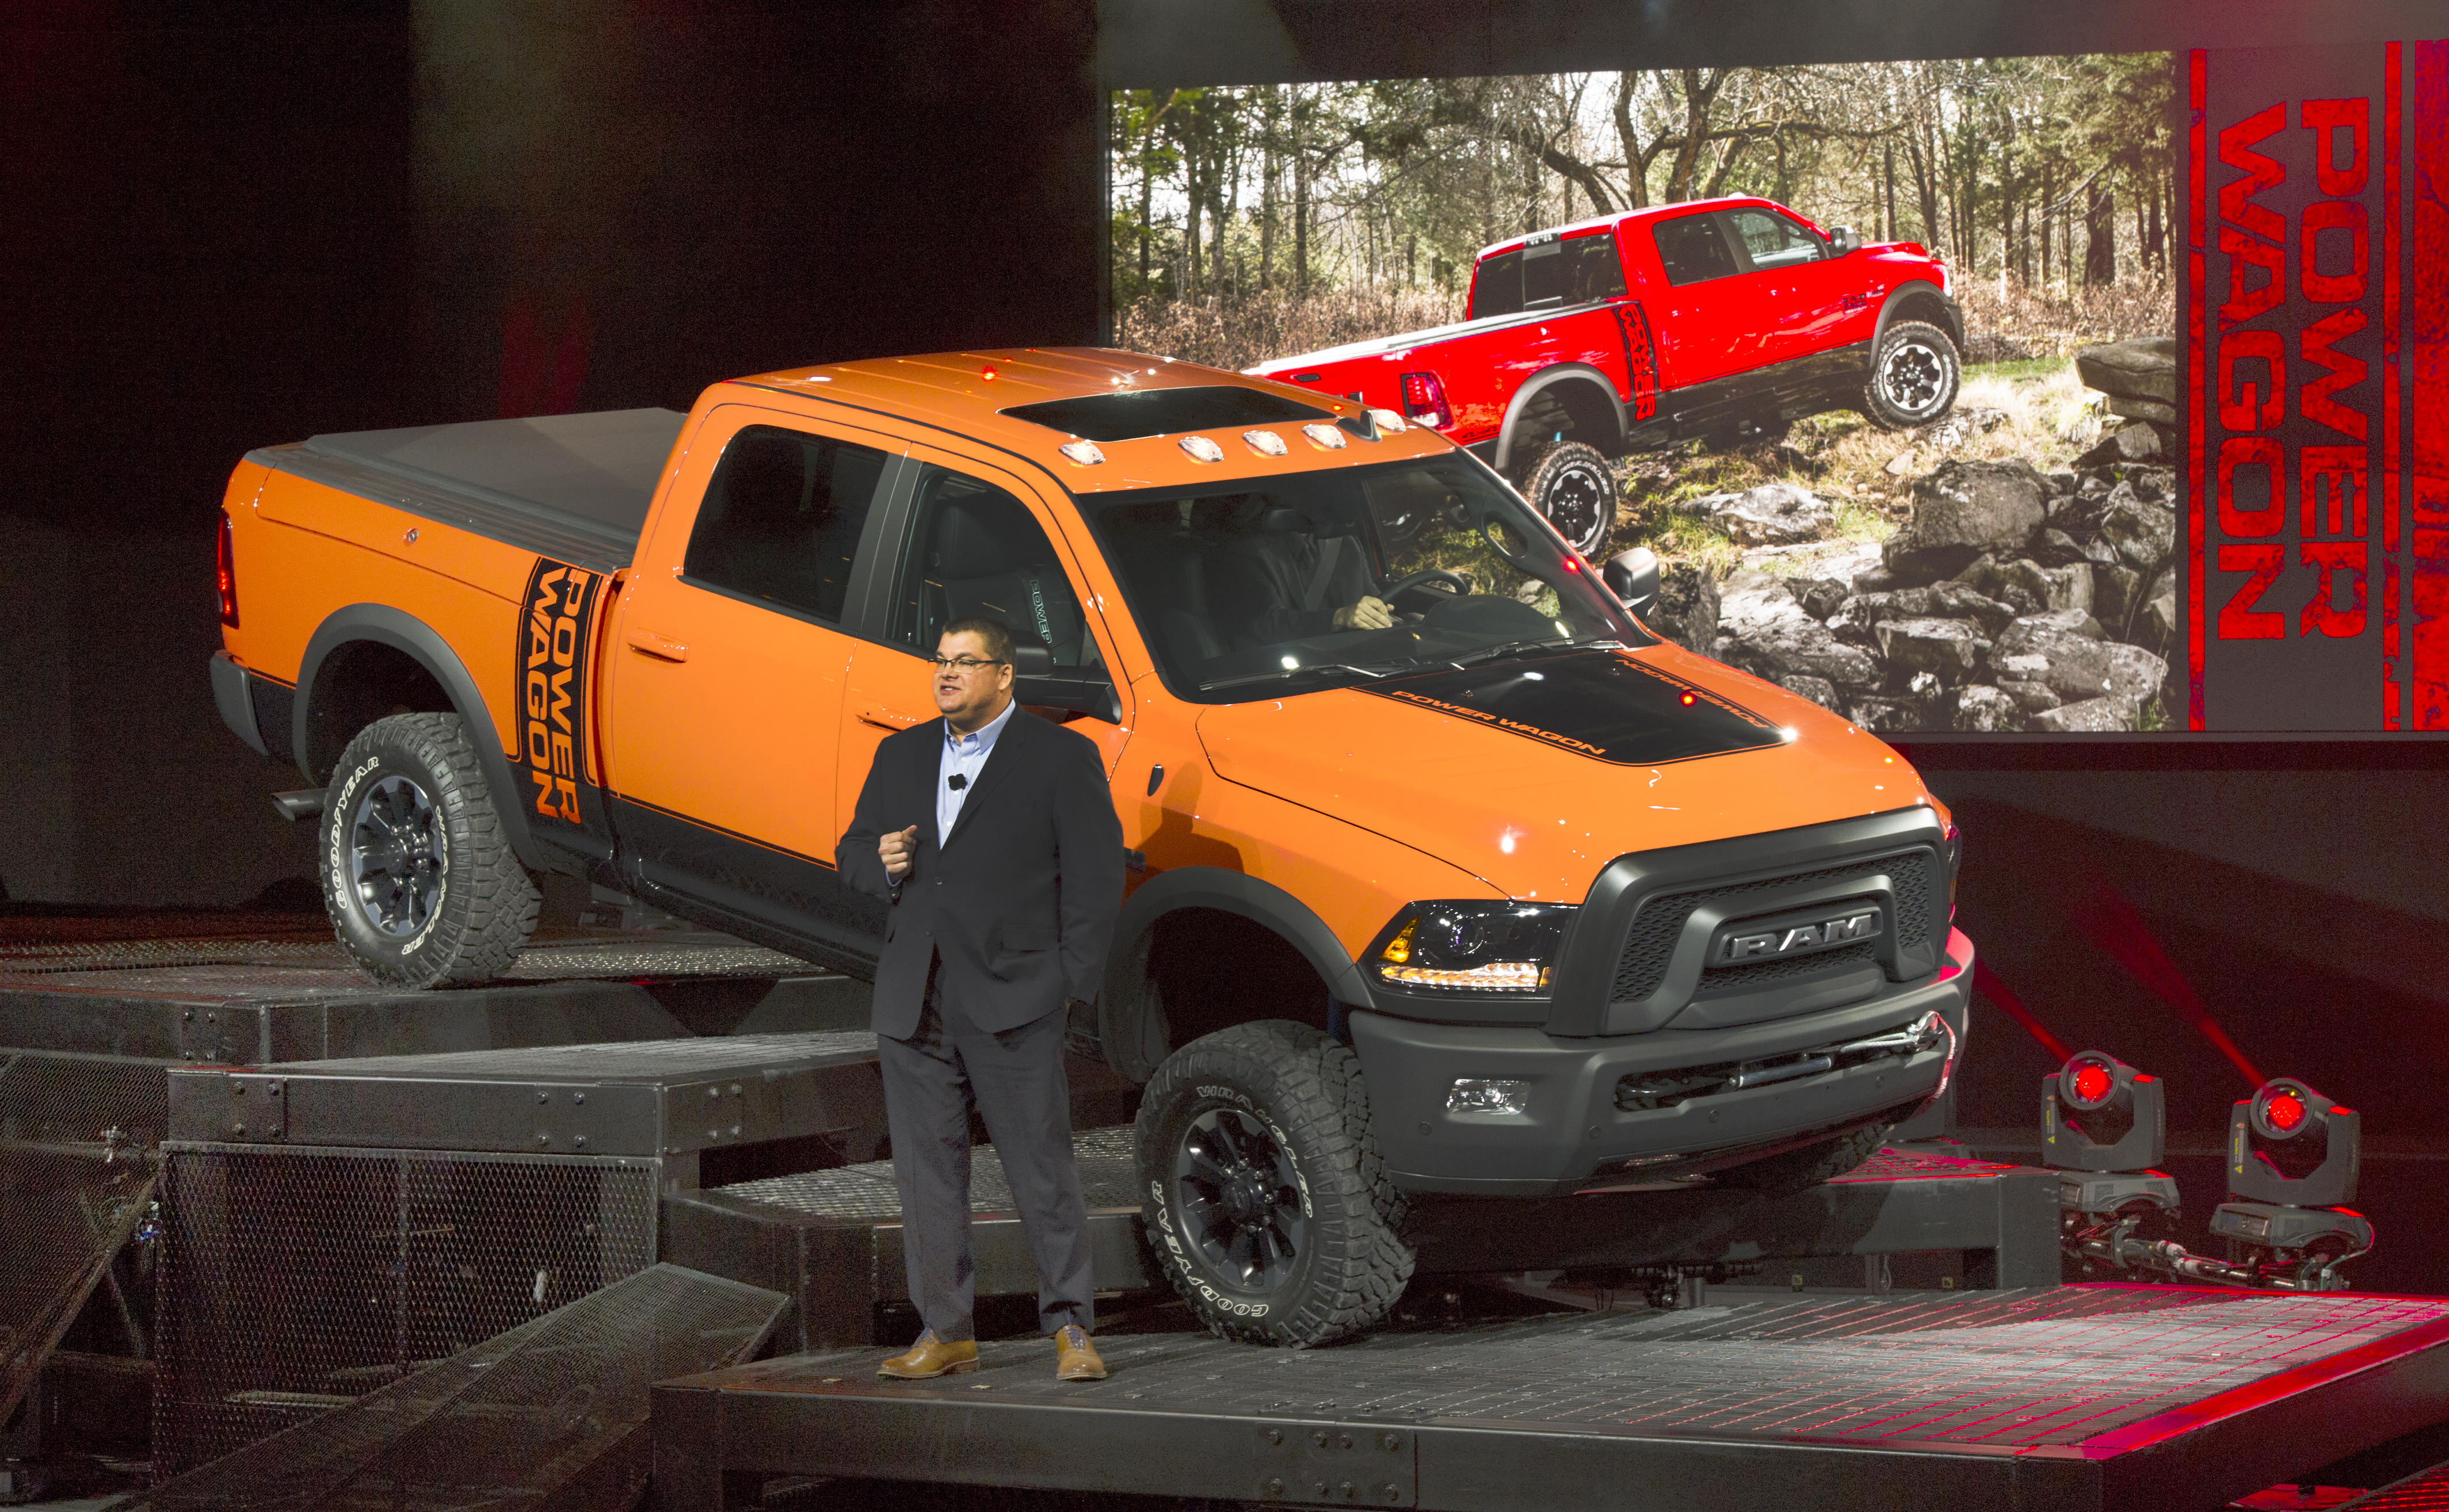 2017 dodge ram power wagon revealed - Dodge Truck 2017